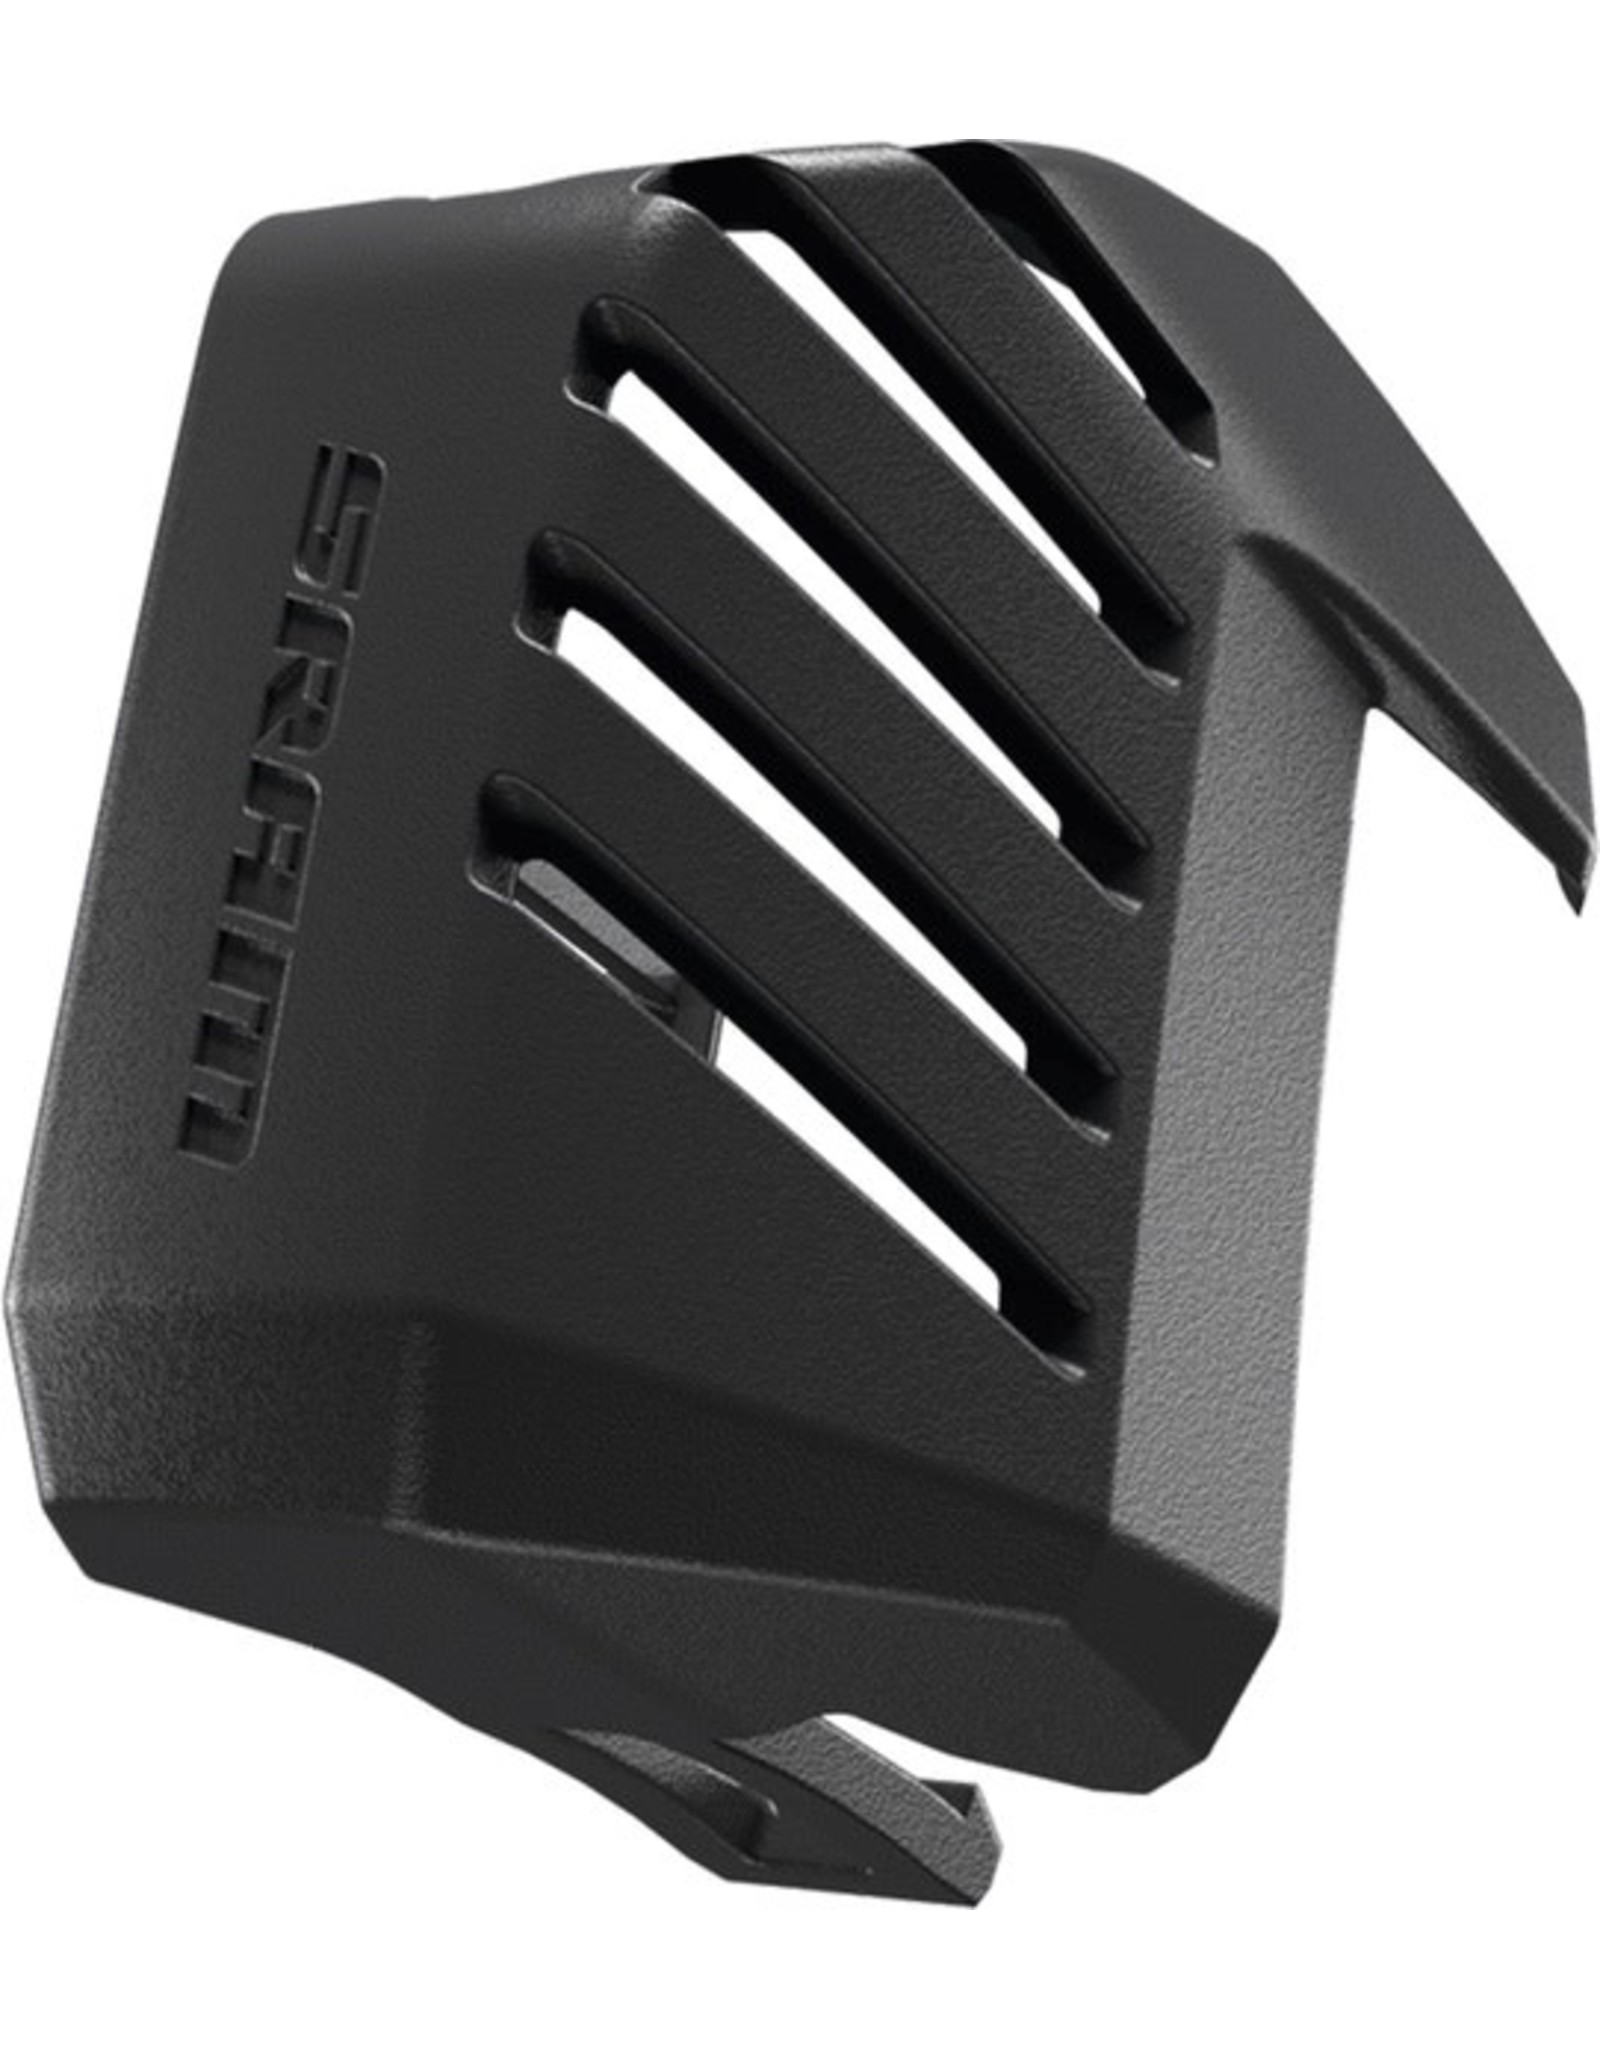 SRAM SRAM, Eagle AXS, Rear Derailleur Battery Cover